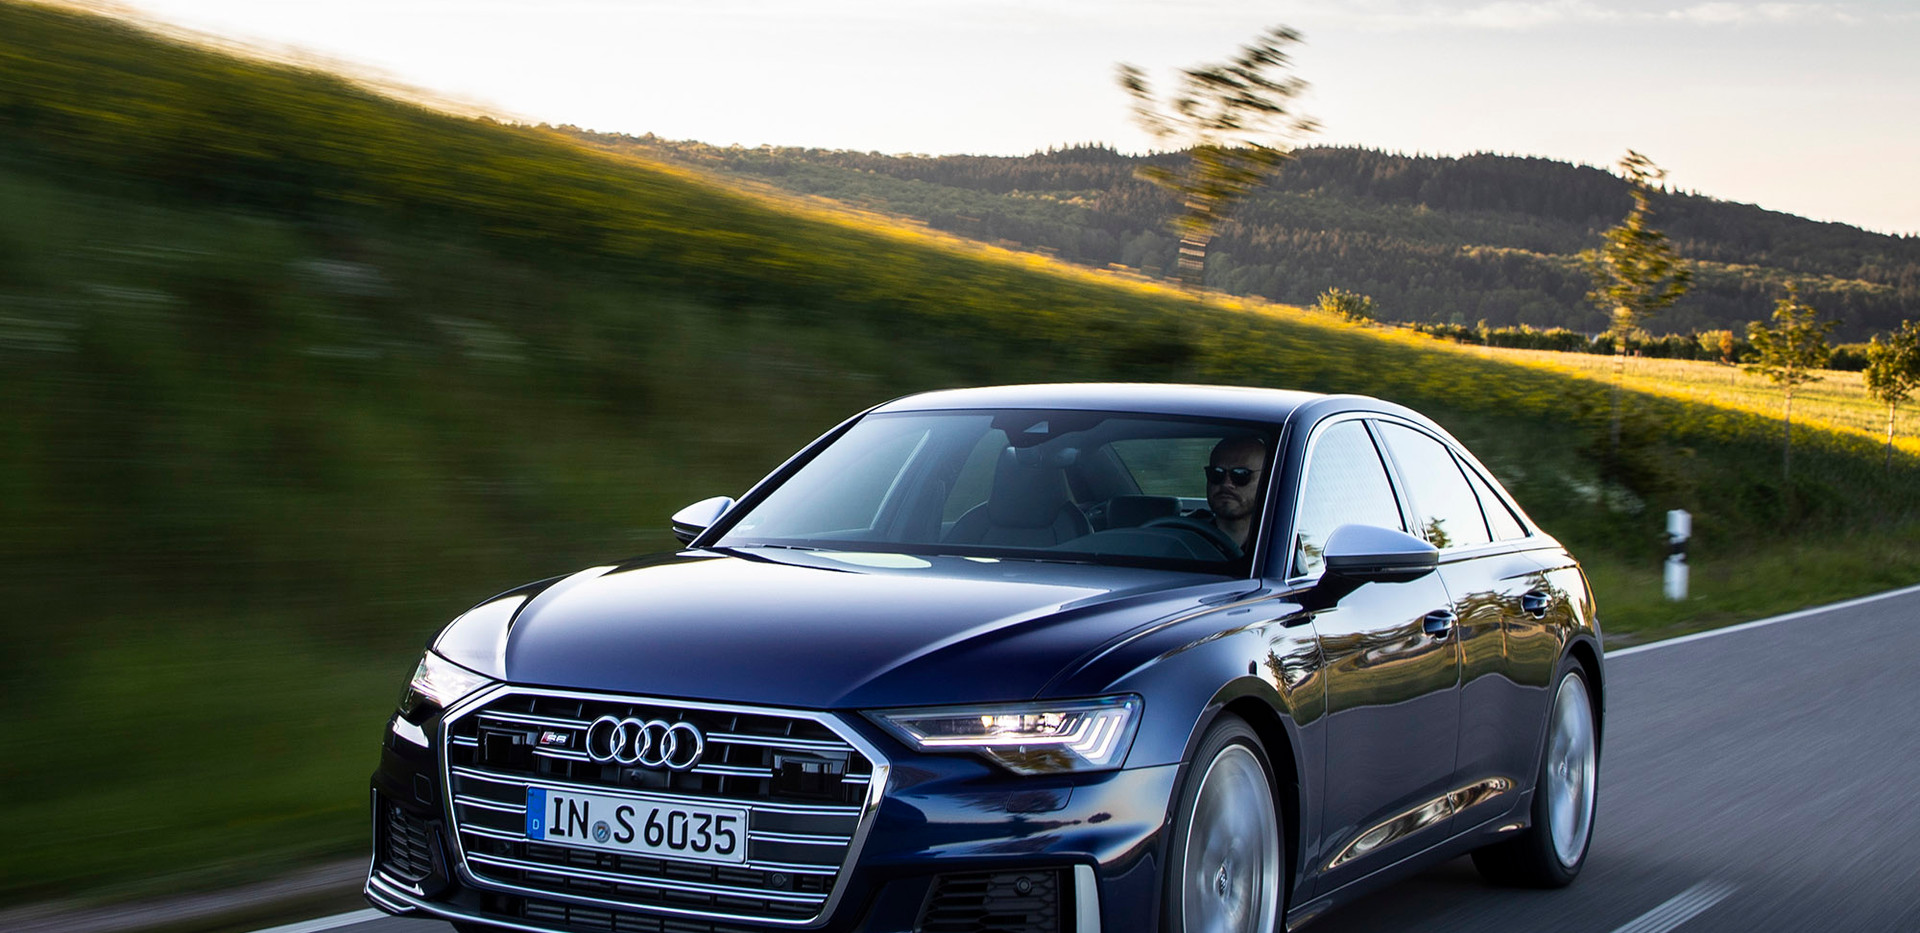 2020-Audi-S6-exterior-oem.jpg